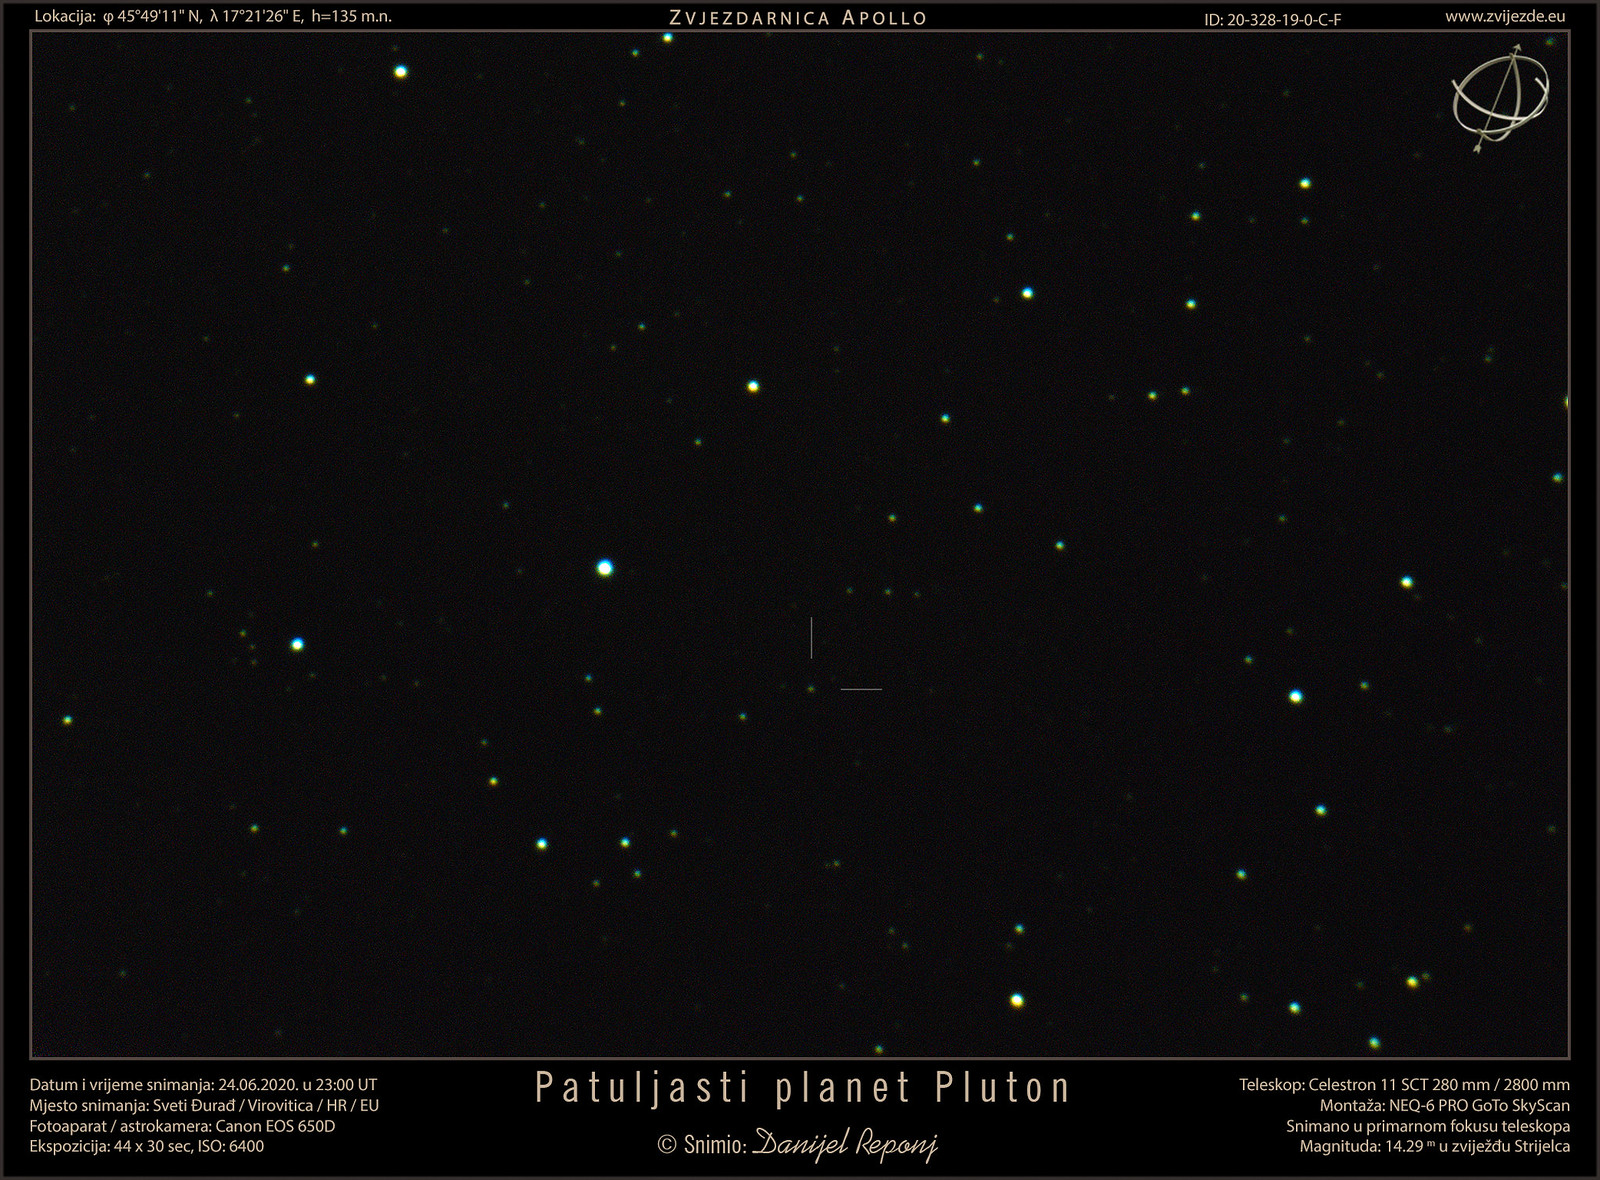 Patuljasti planet Pluton, 24.6.2020.